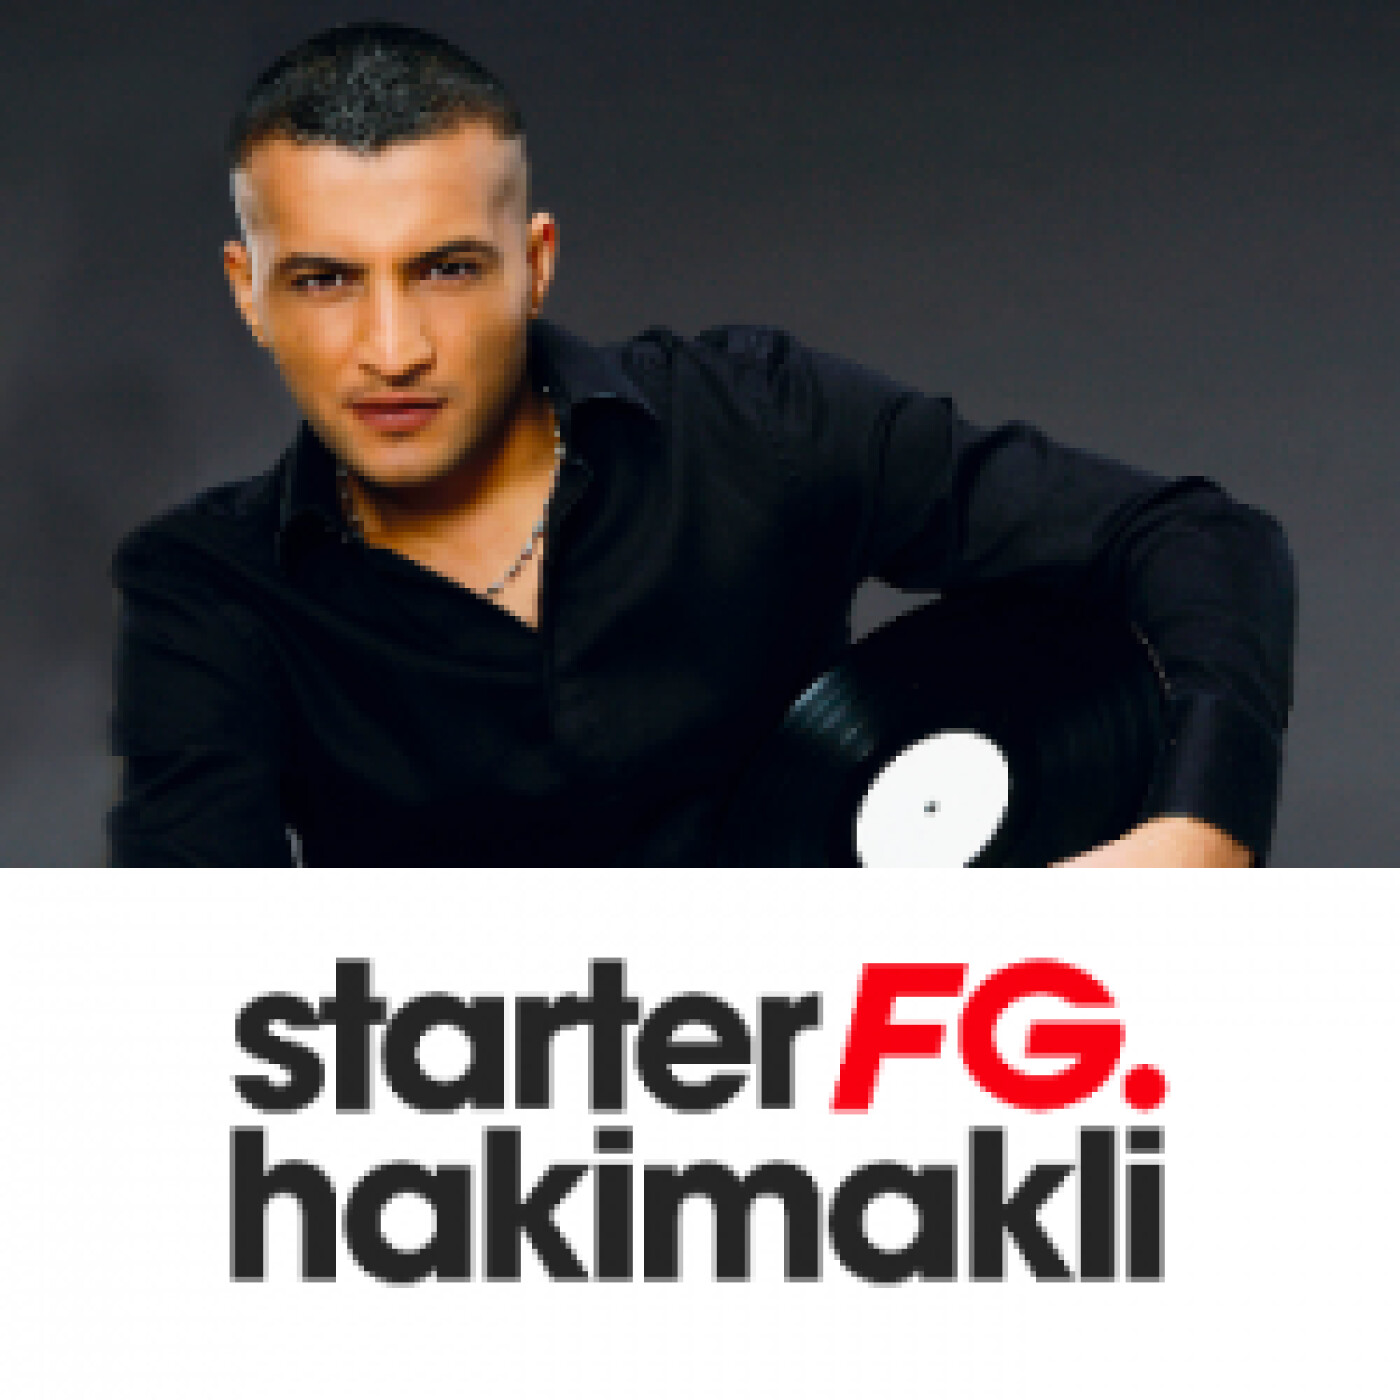 STARTER FG BY HAKIMAKLI JEUDI 11 MARS 2021